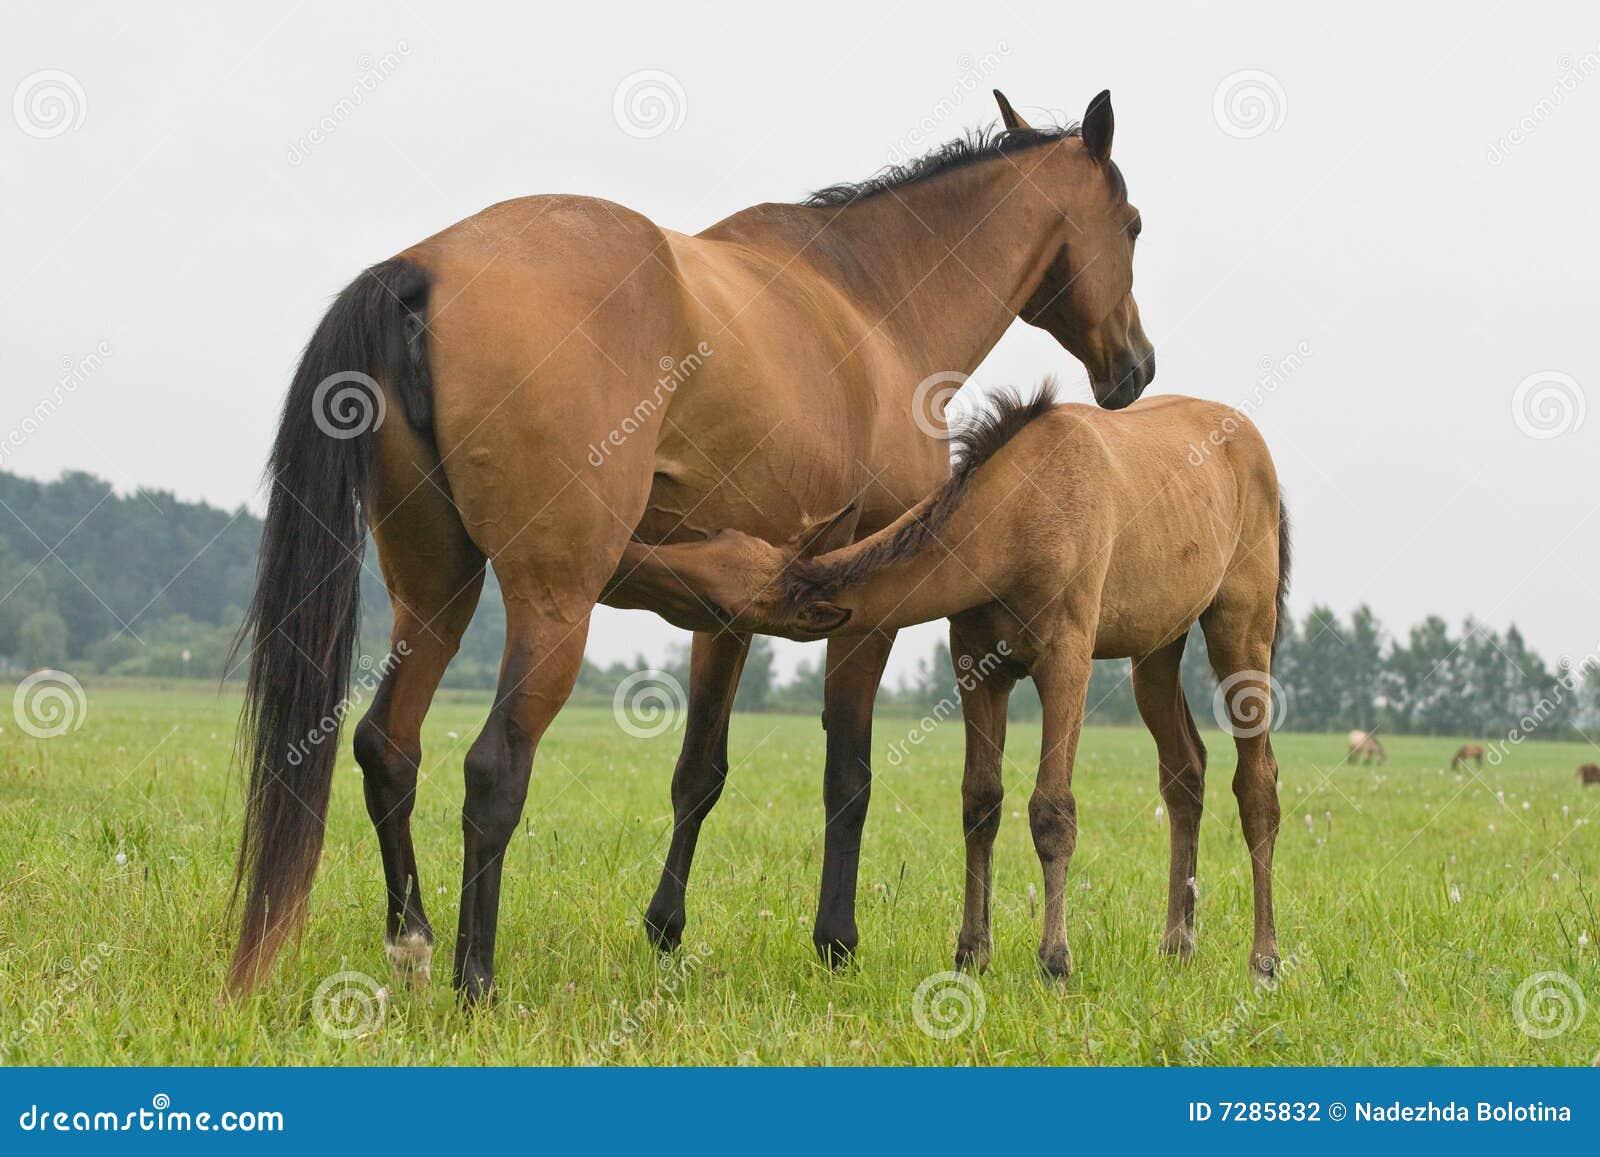 Foal suckling his mother